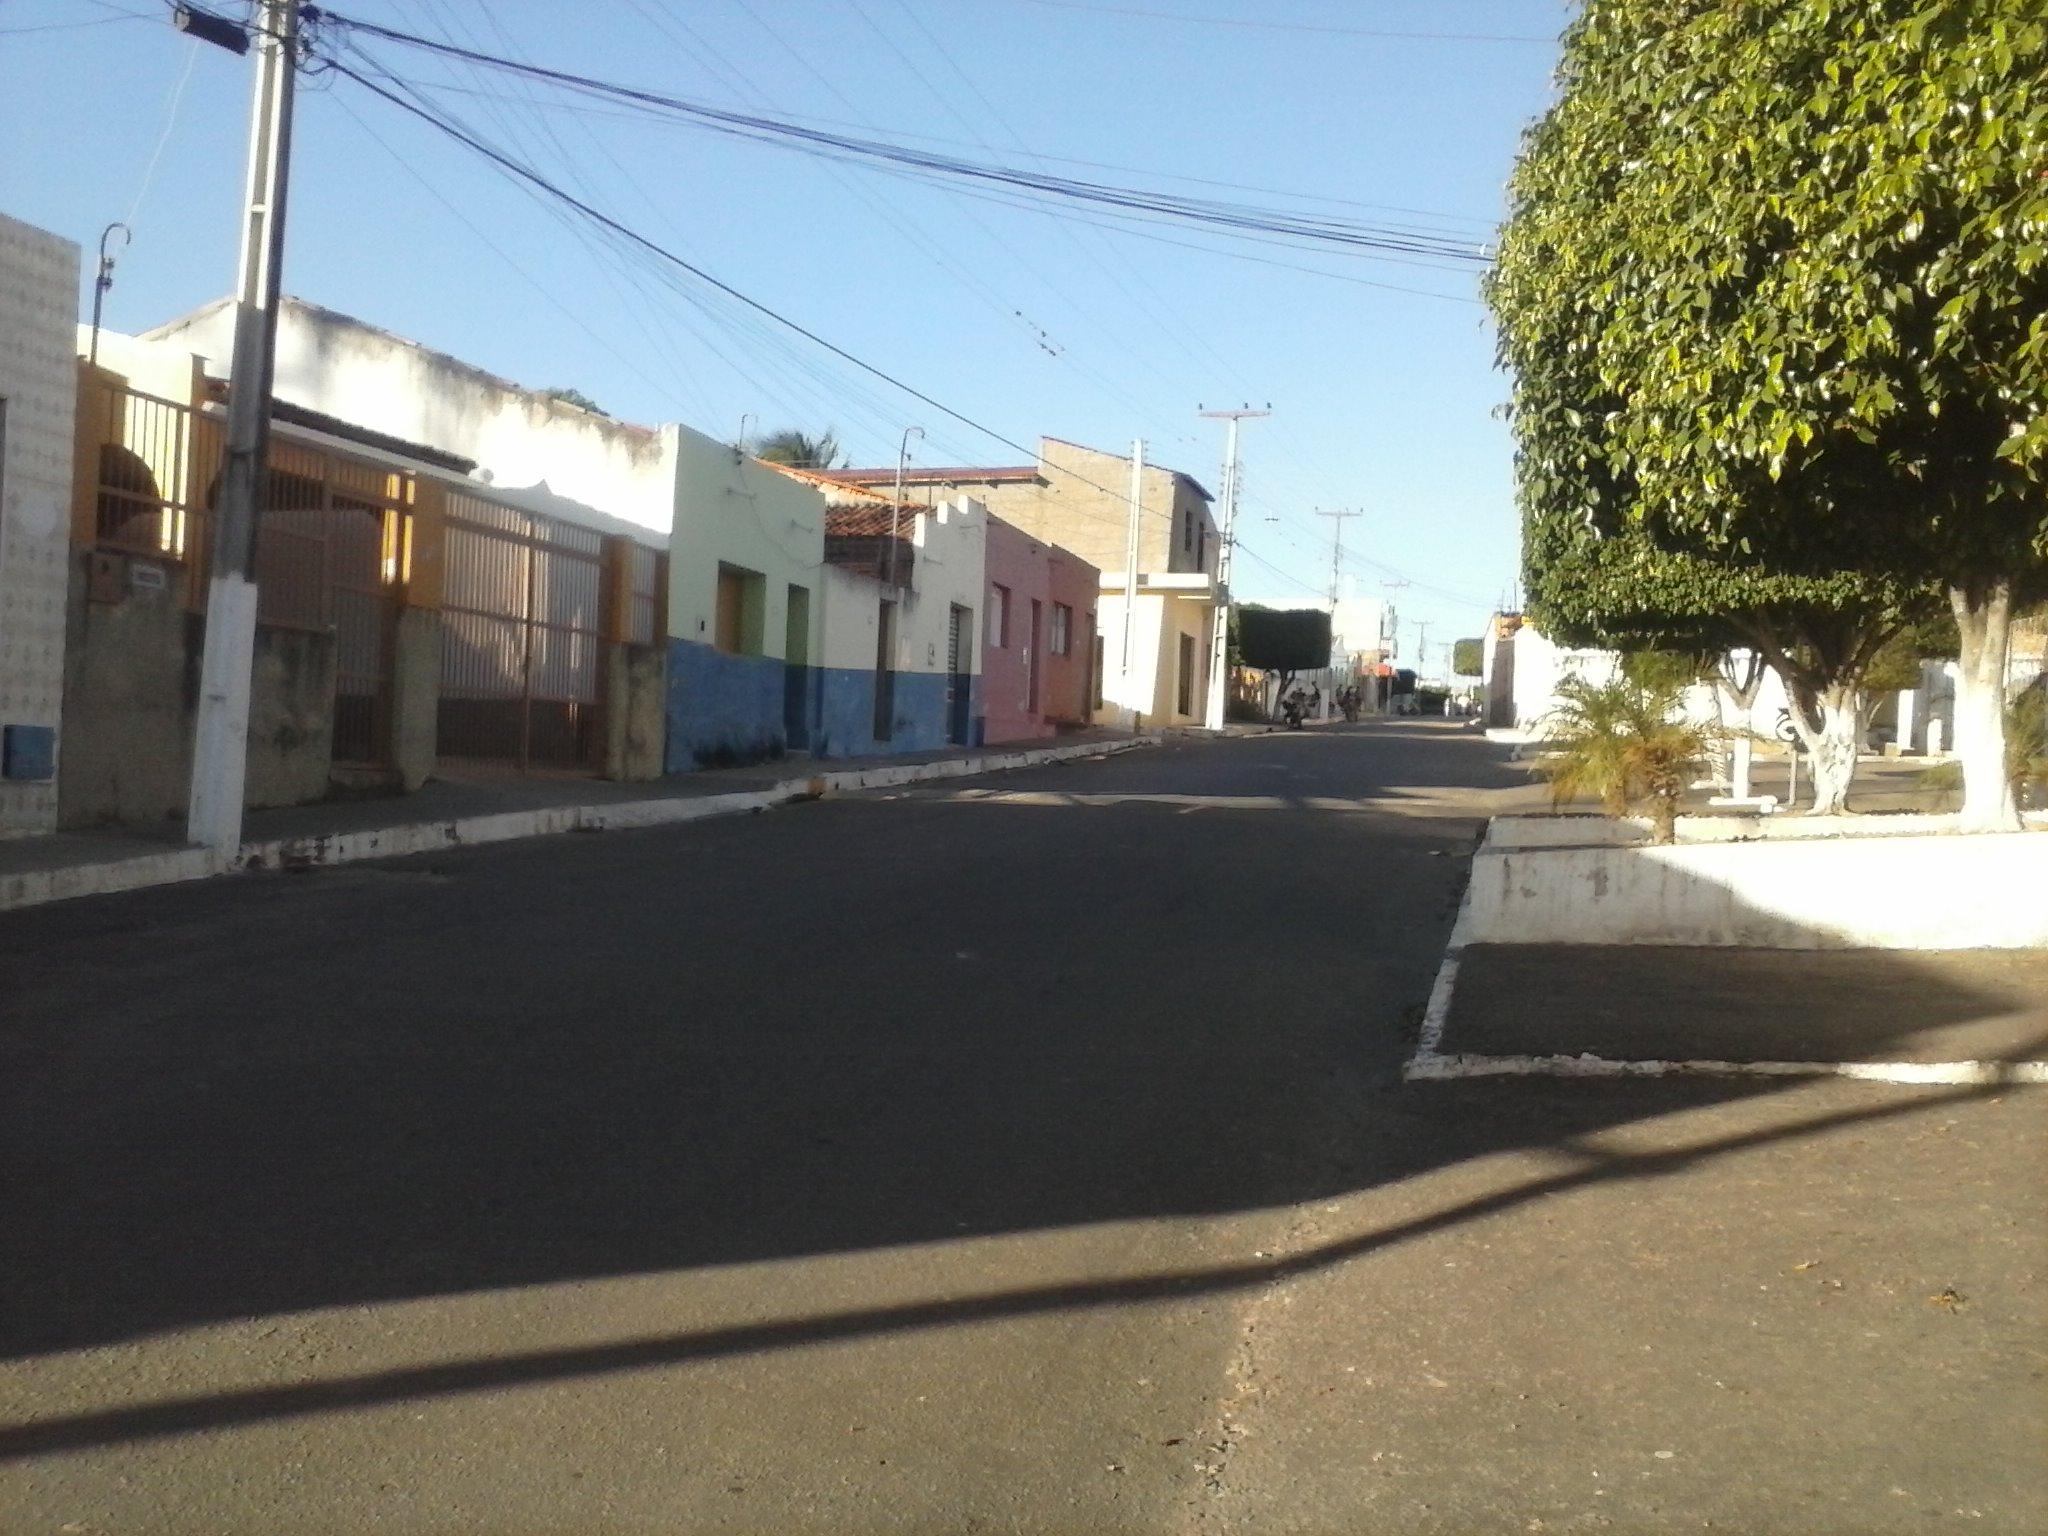 Altaneira Ceará fonte: upload.wikimedia.org